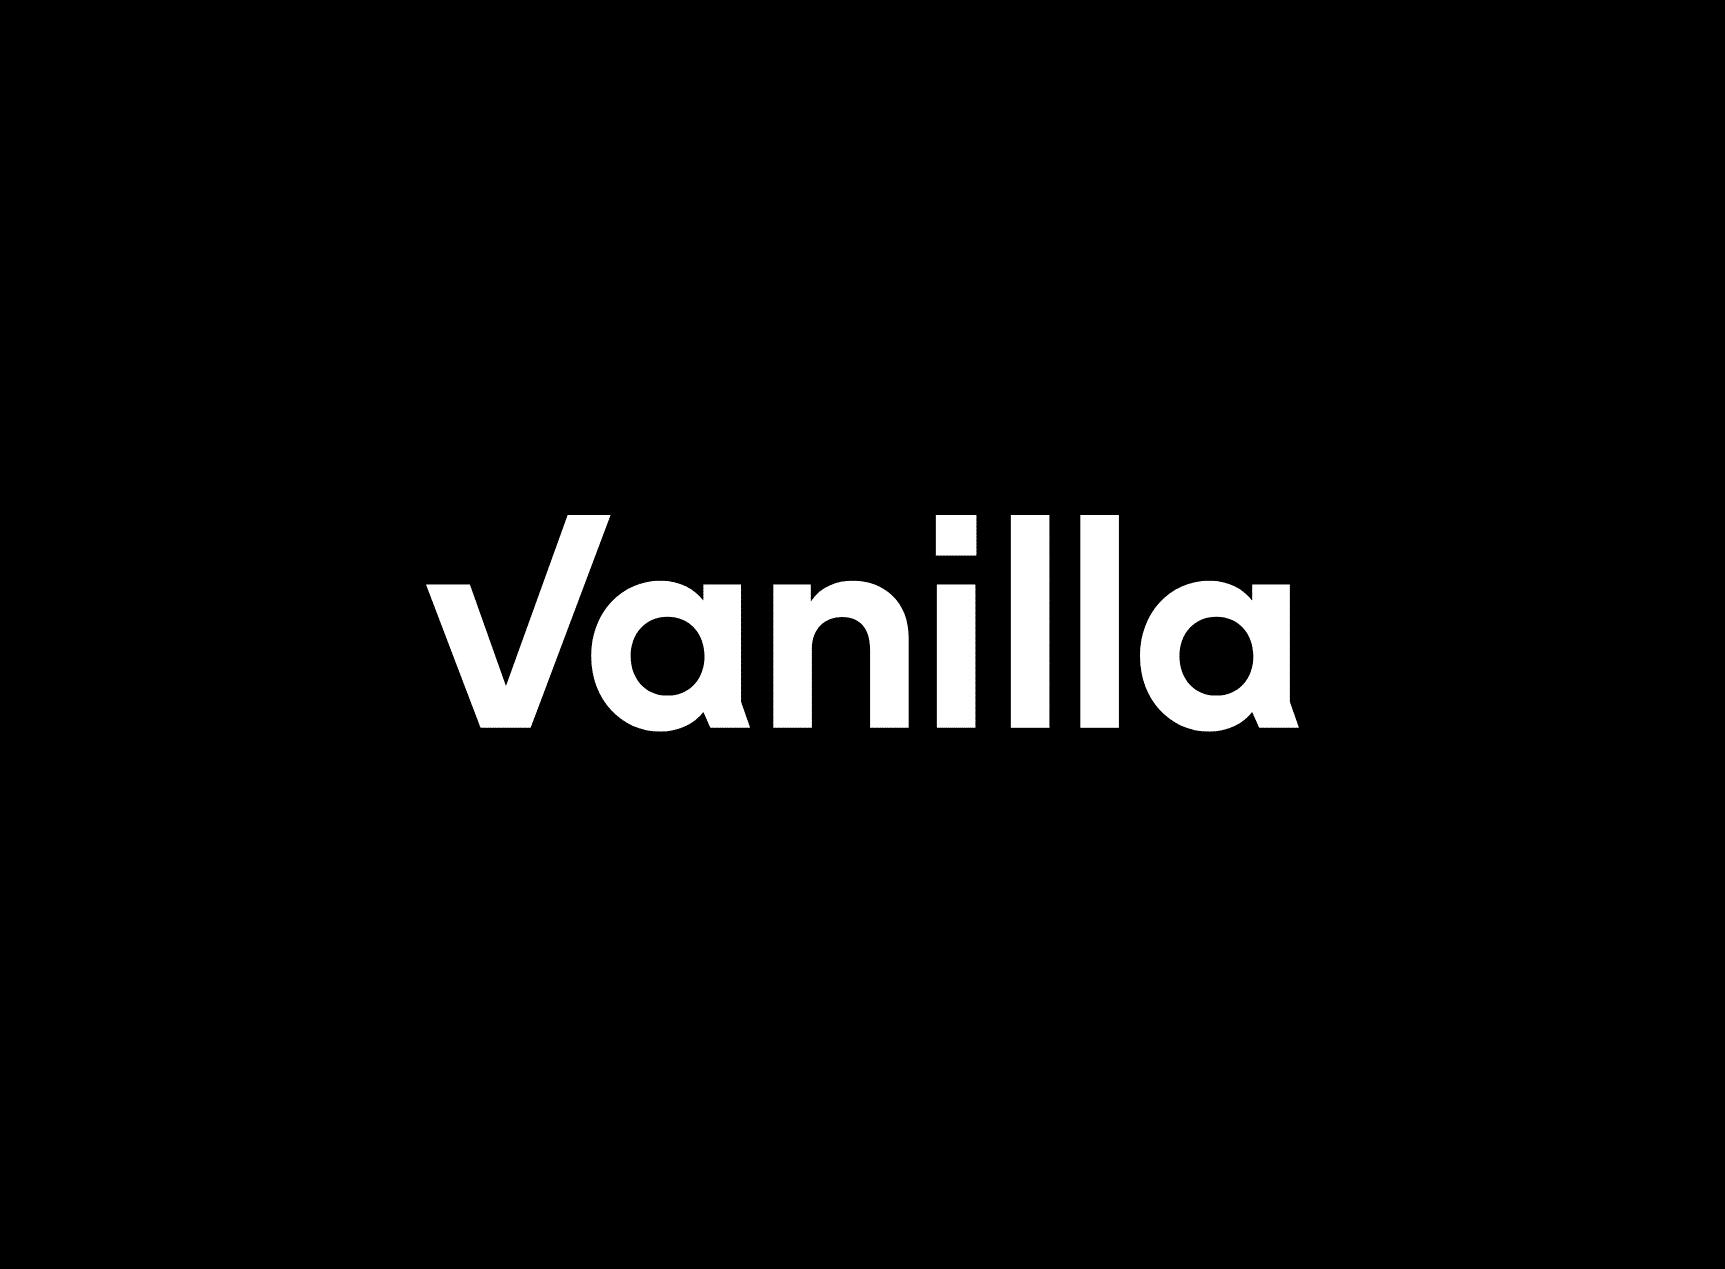 Vanilla identity by TAC